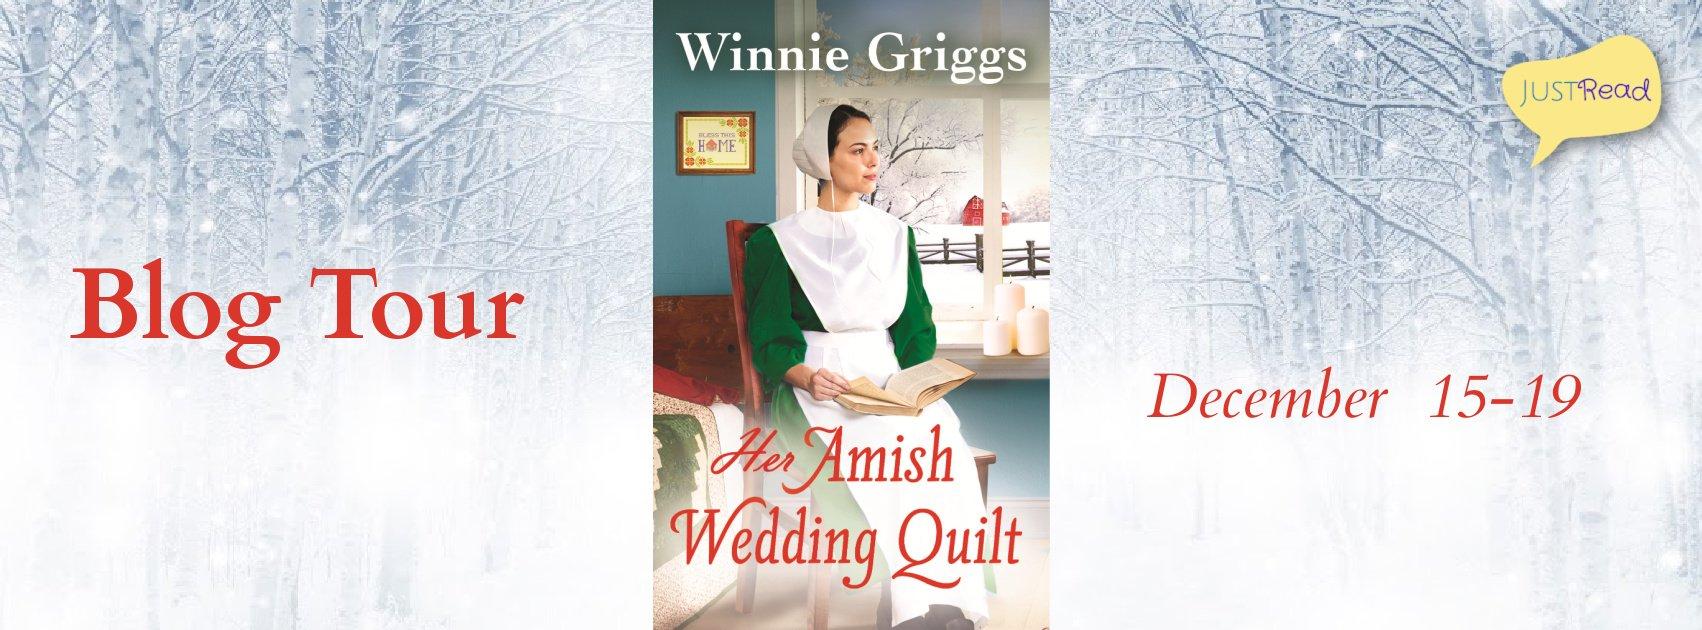 Her Amish Wedding Quilt Blog Tour